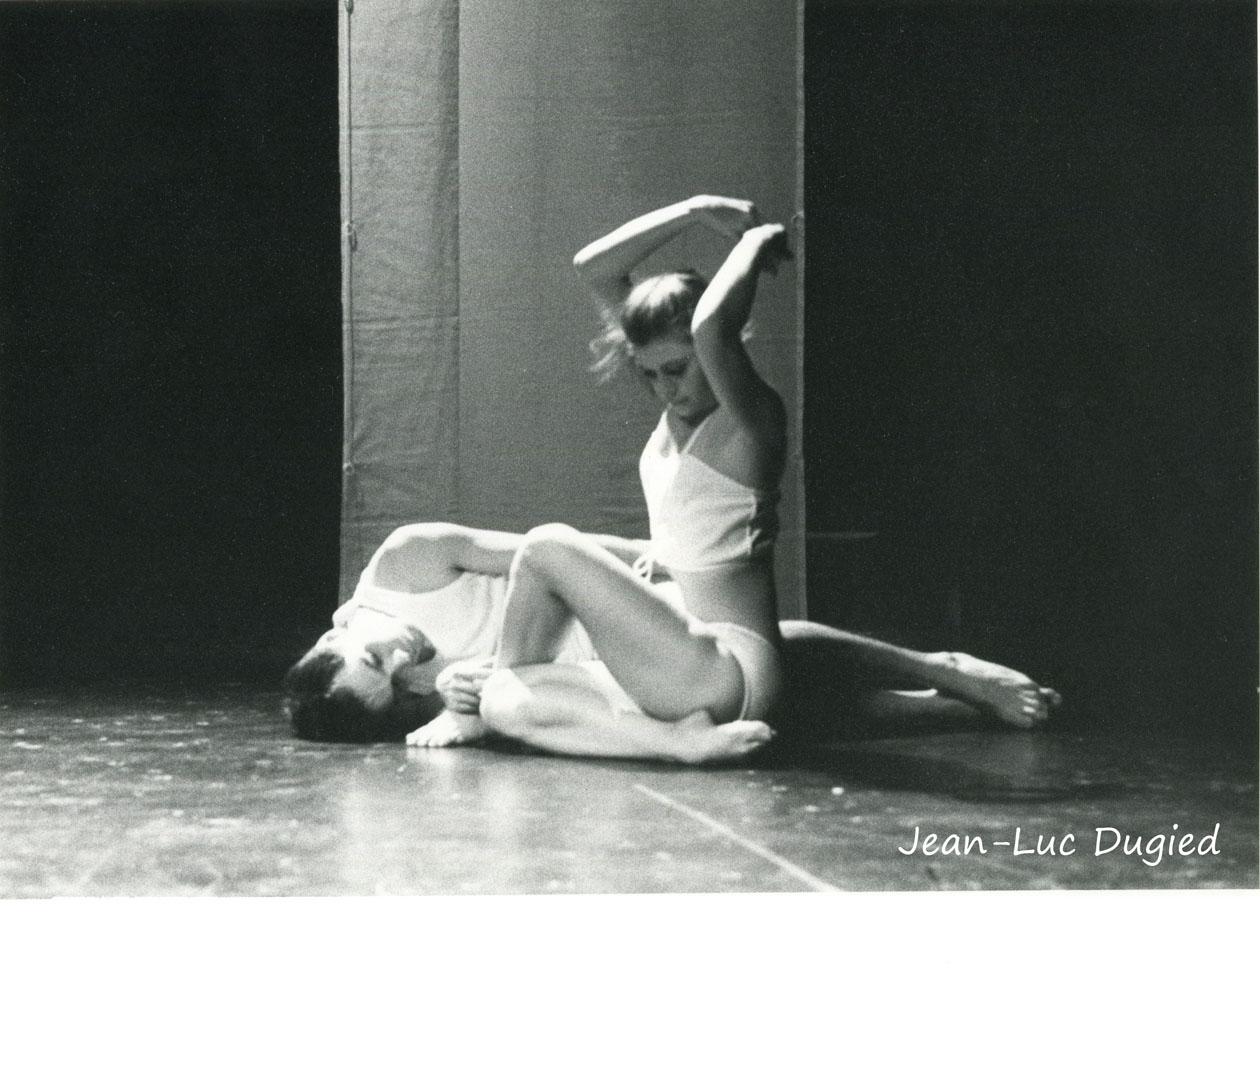 38 Dugied Fabrice - bohème - Bernard Collin et Geneviève Mazin - 1988